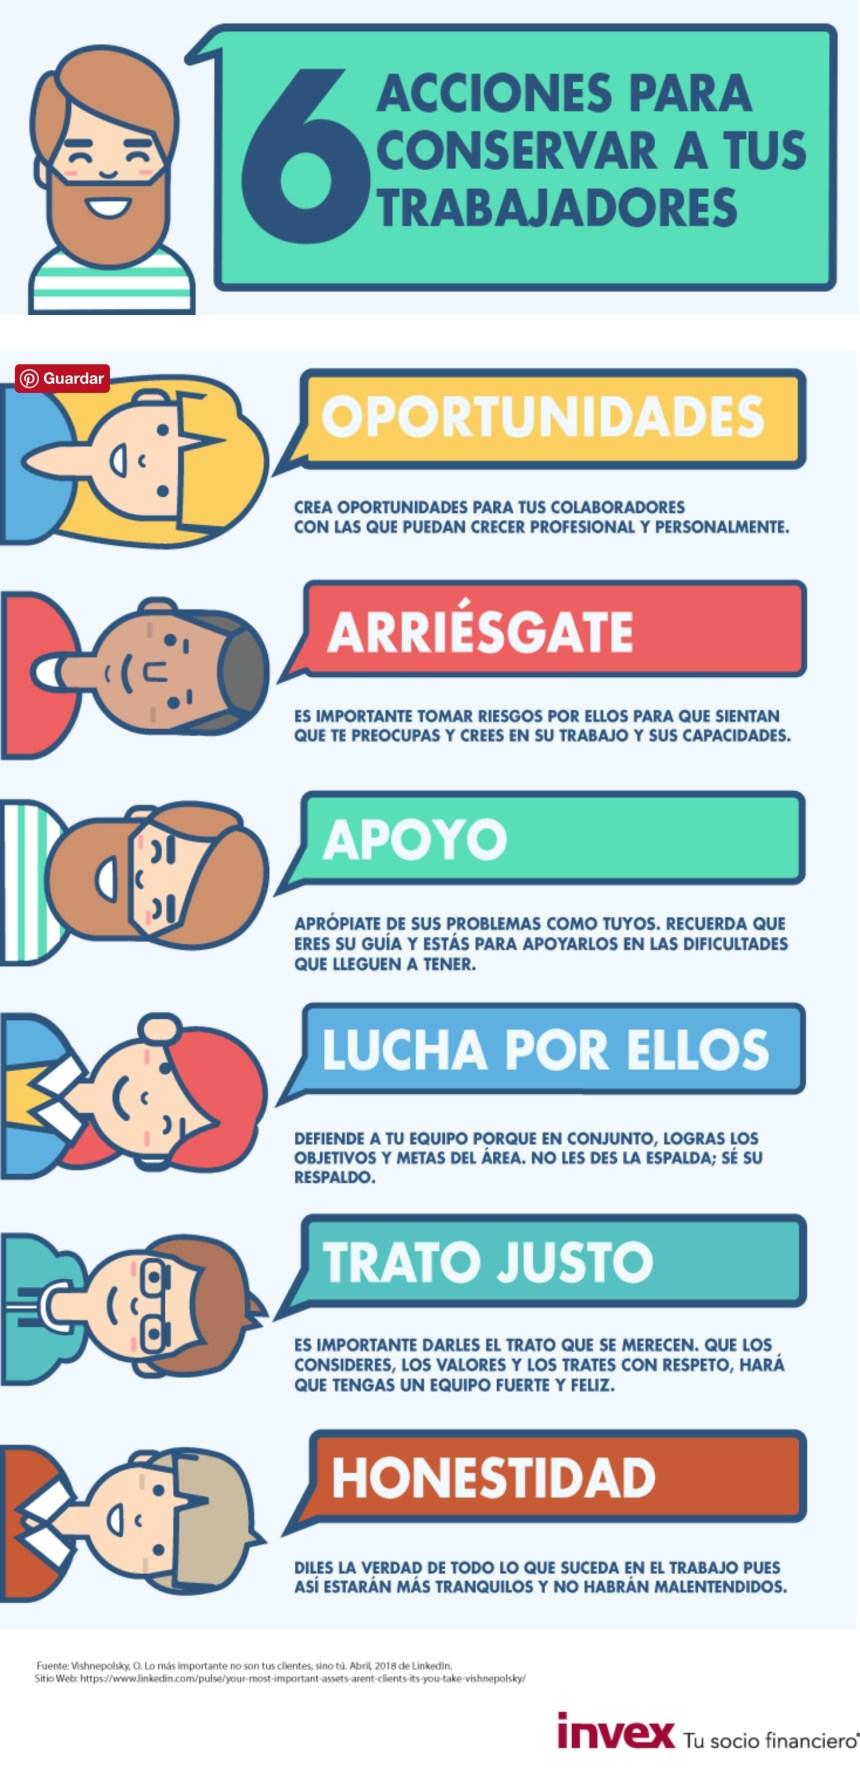 6 acciones para conservar a tus trabajadores #infografia #infographic #rrhh